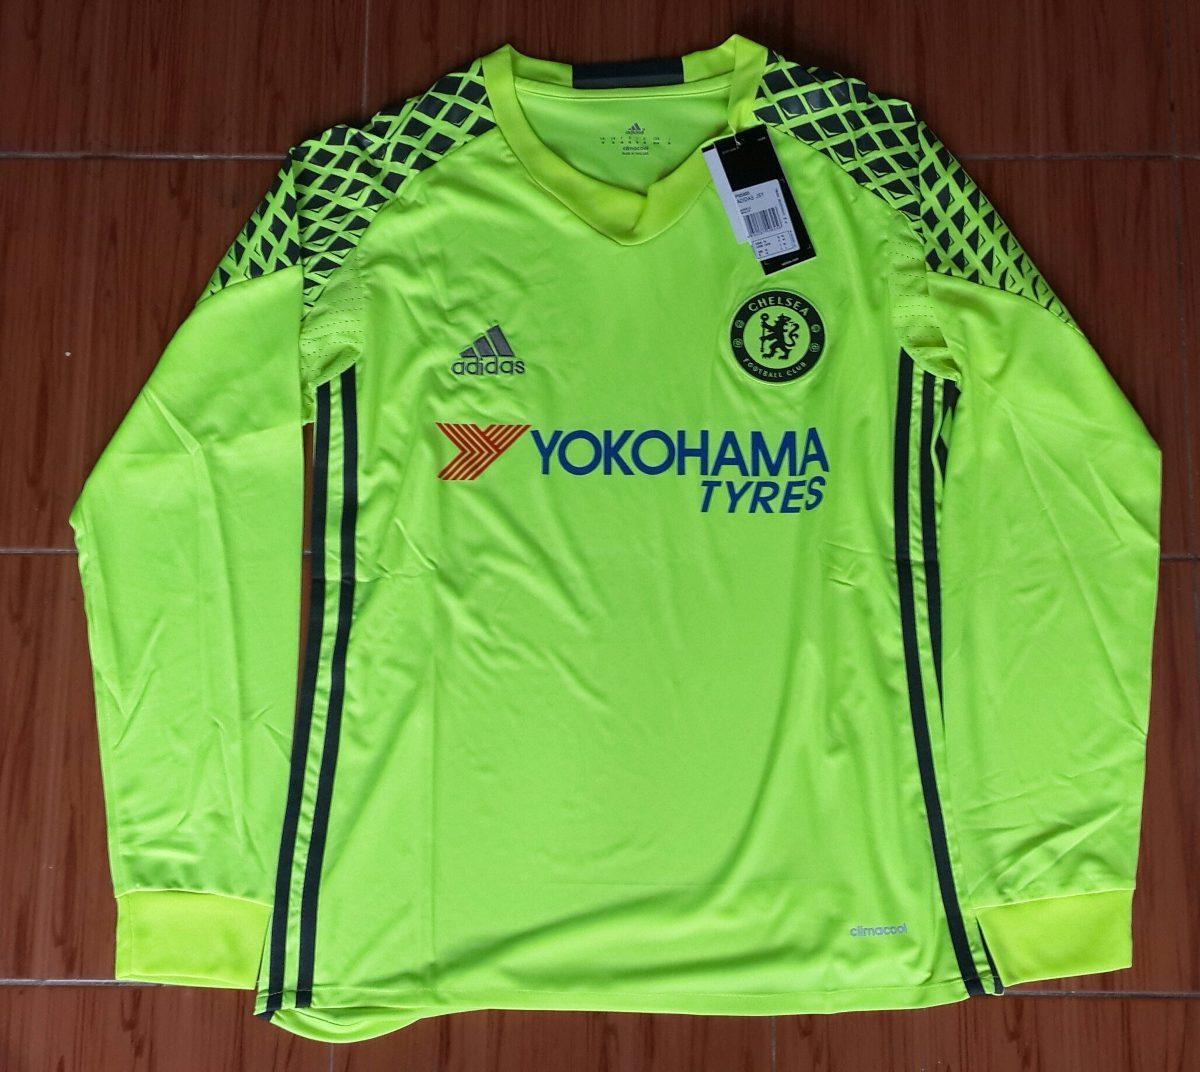 6b9f2e671e Camiseta Arquero Manga Larga Chelsea 2016 2017 Courtois -   849